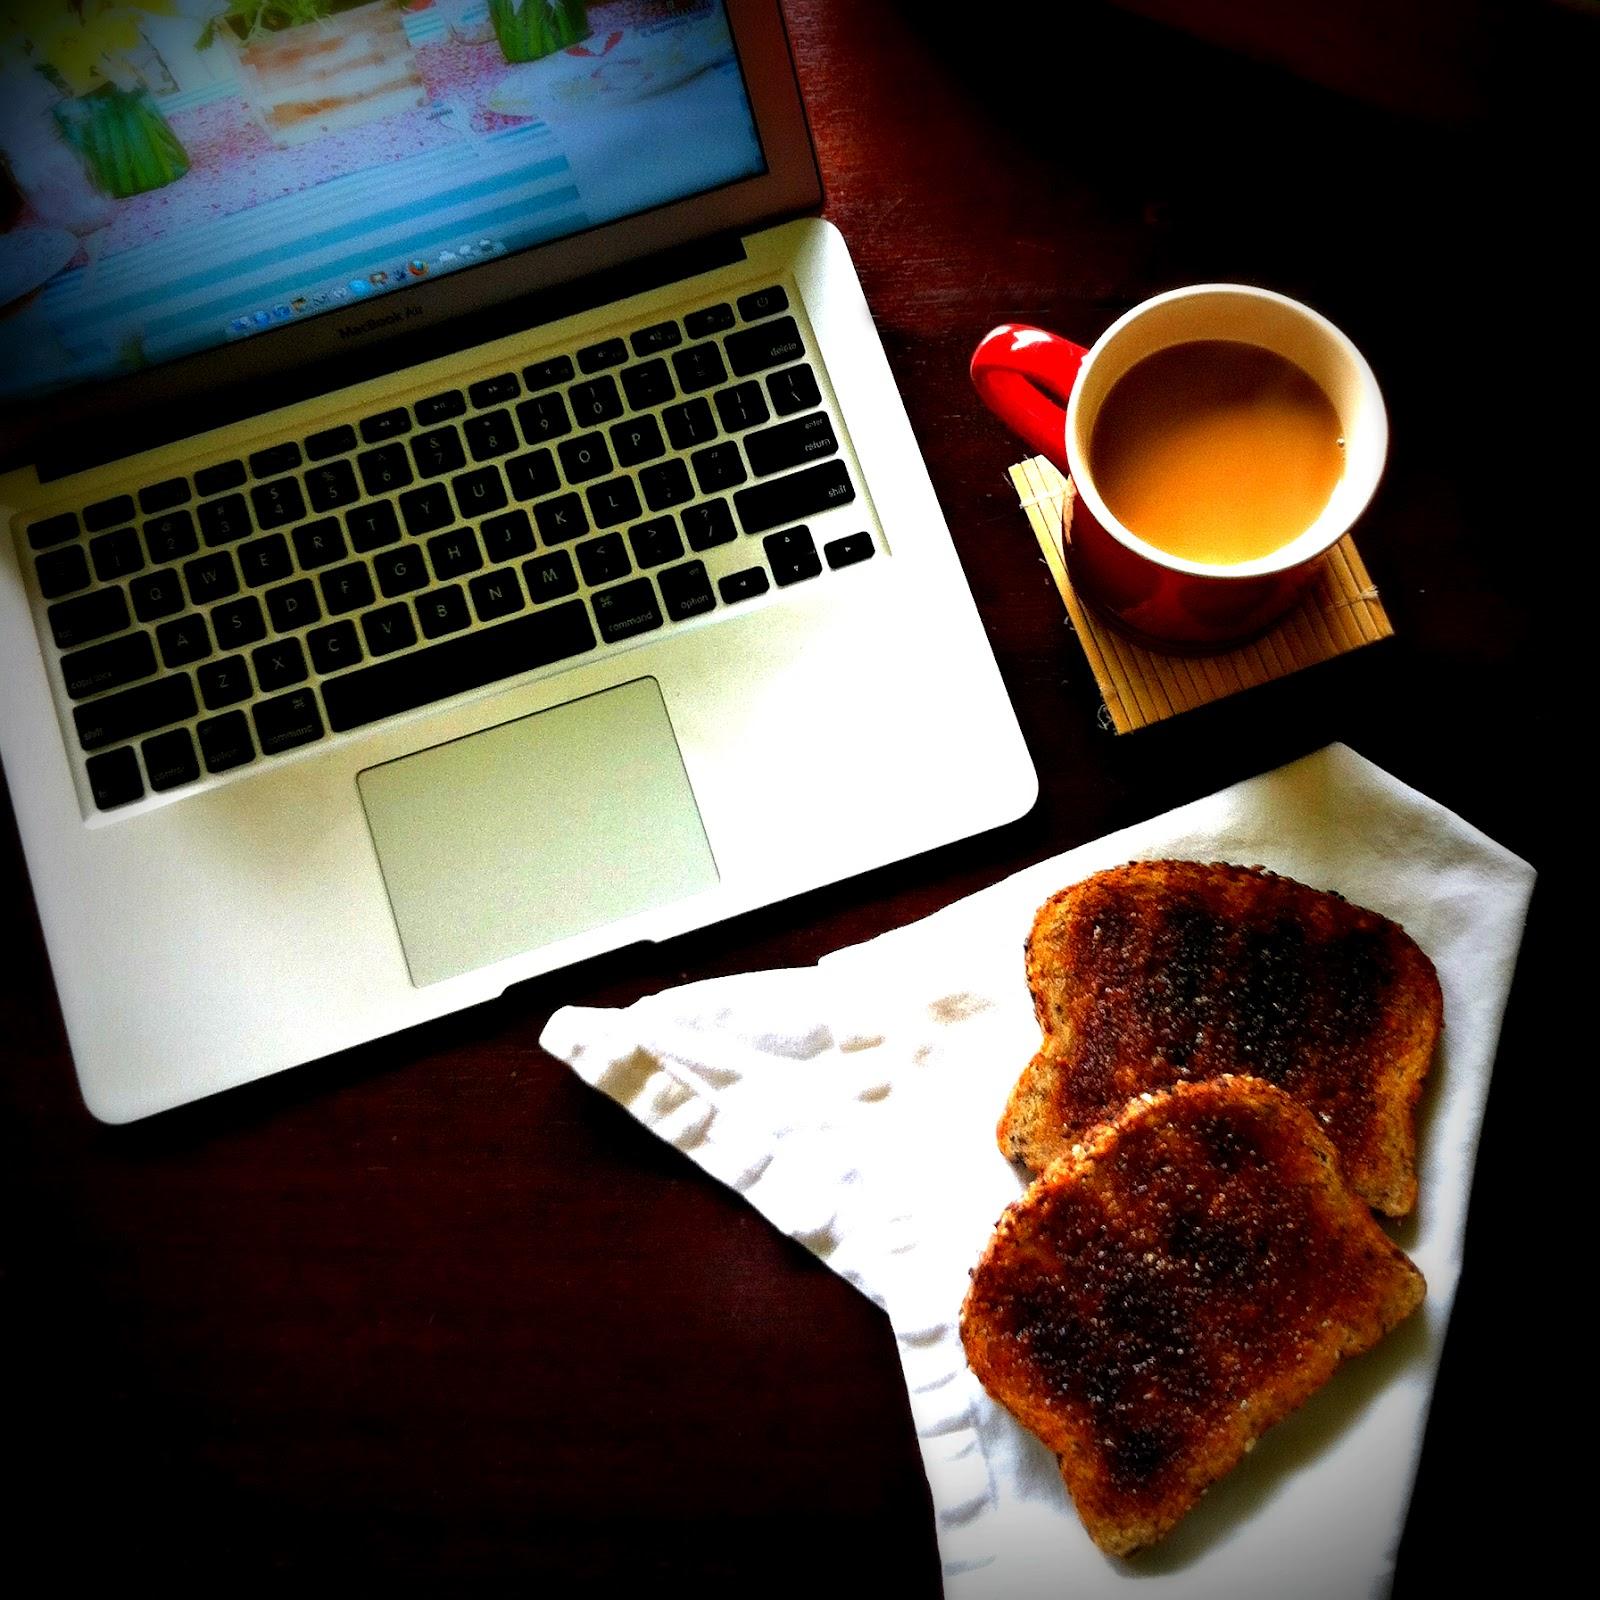 Sunday Morning Breakfast Drive, Nov. 15 2015 | richardscarblog |Sunday Morning Breakfast